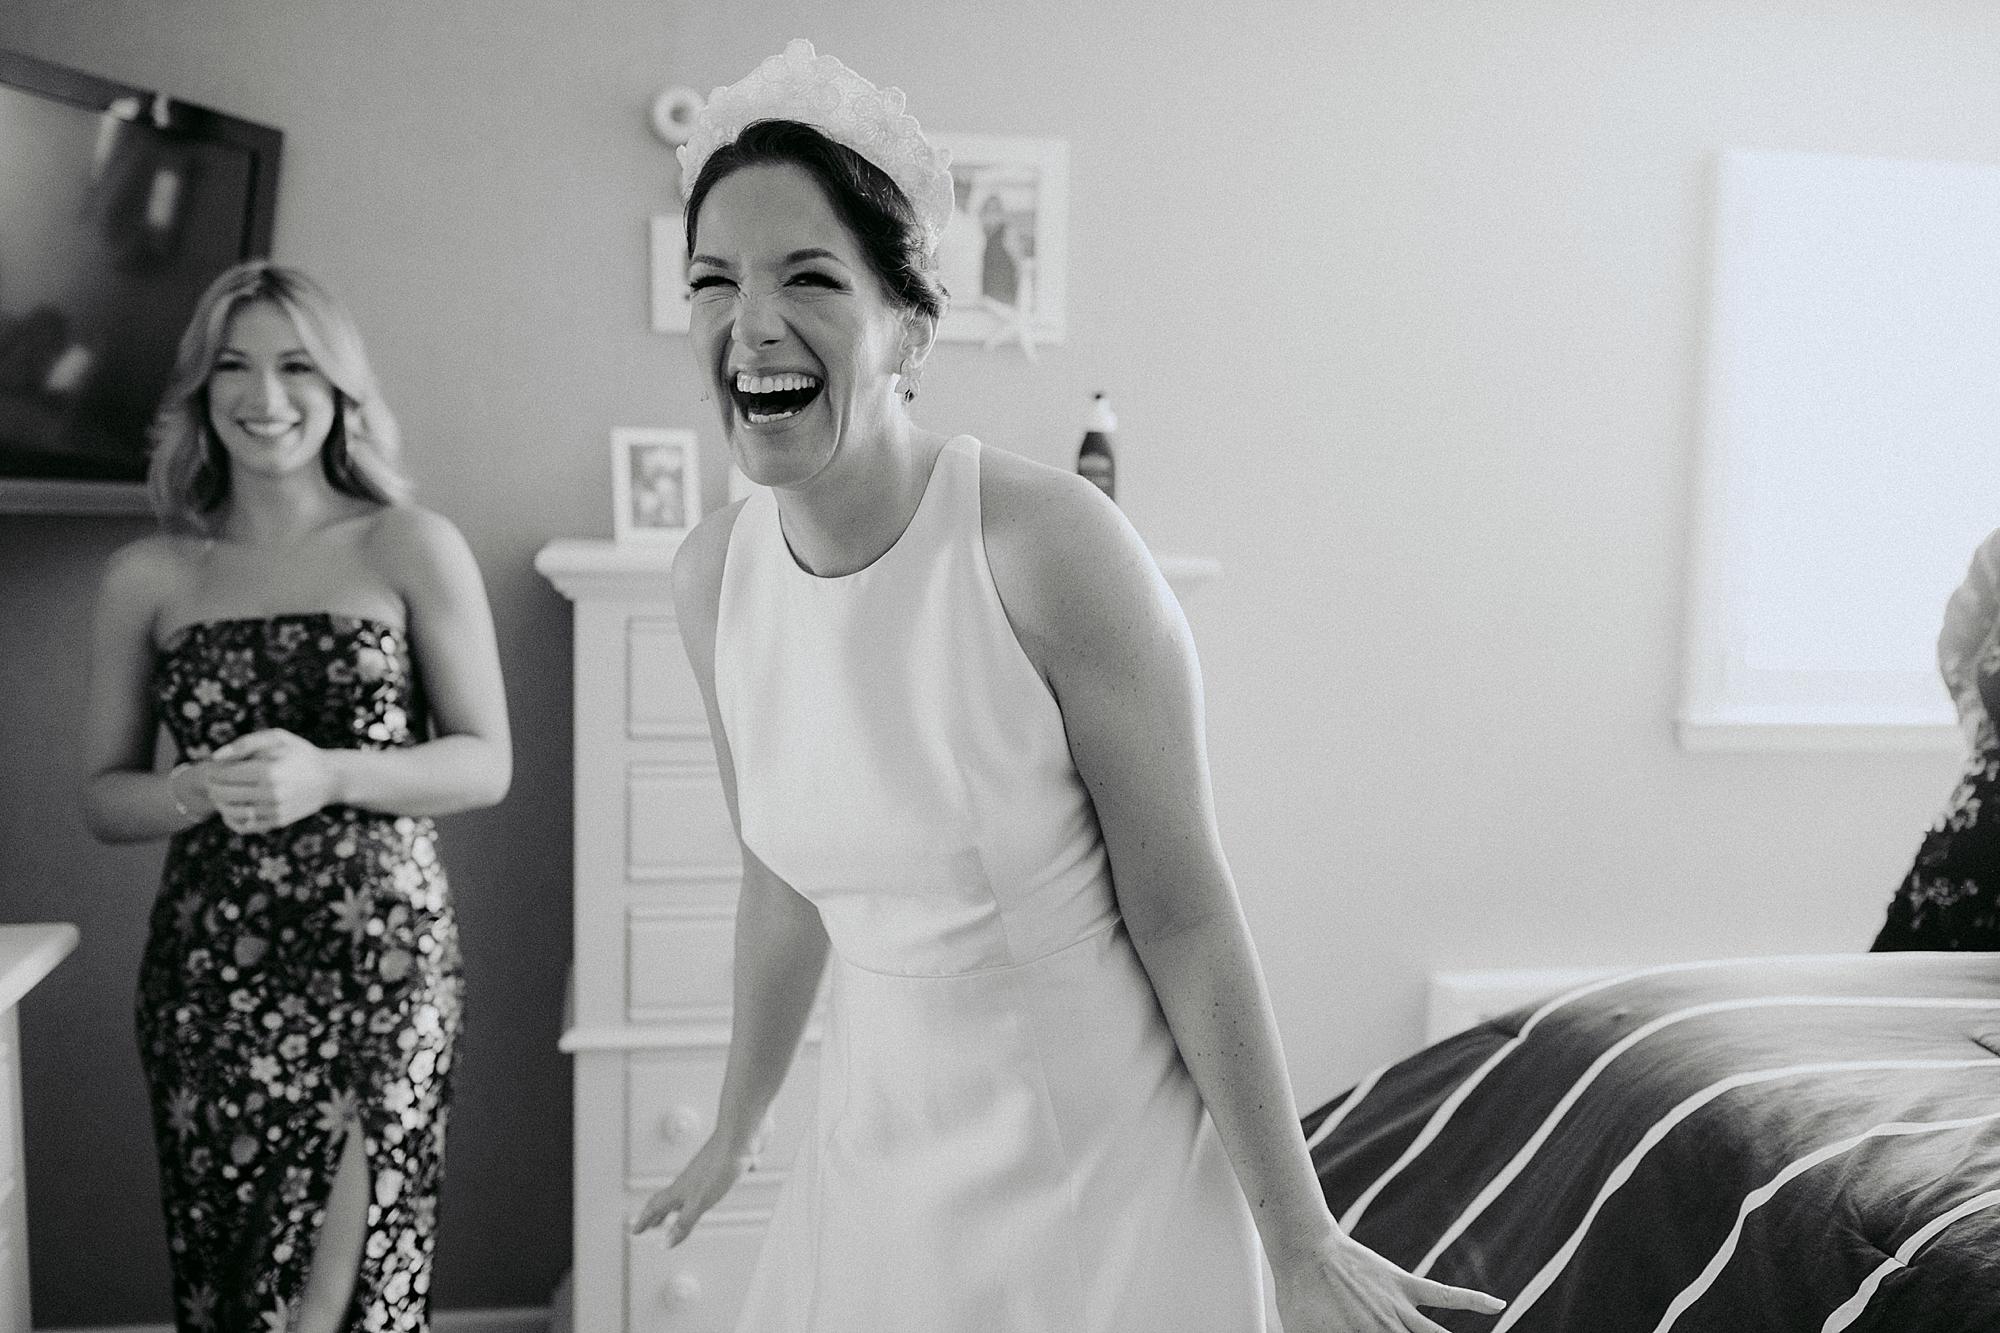 weddingwire 2021 couples' choice awards